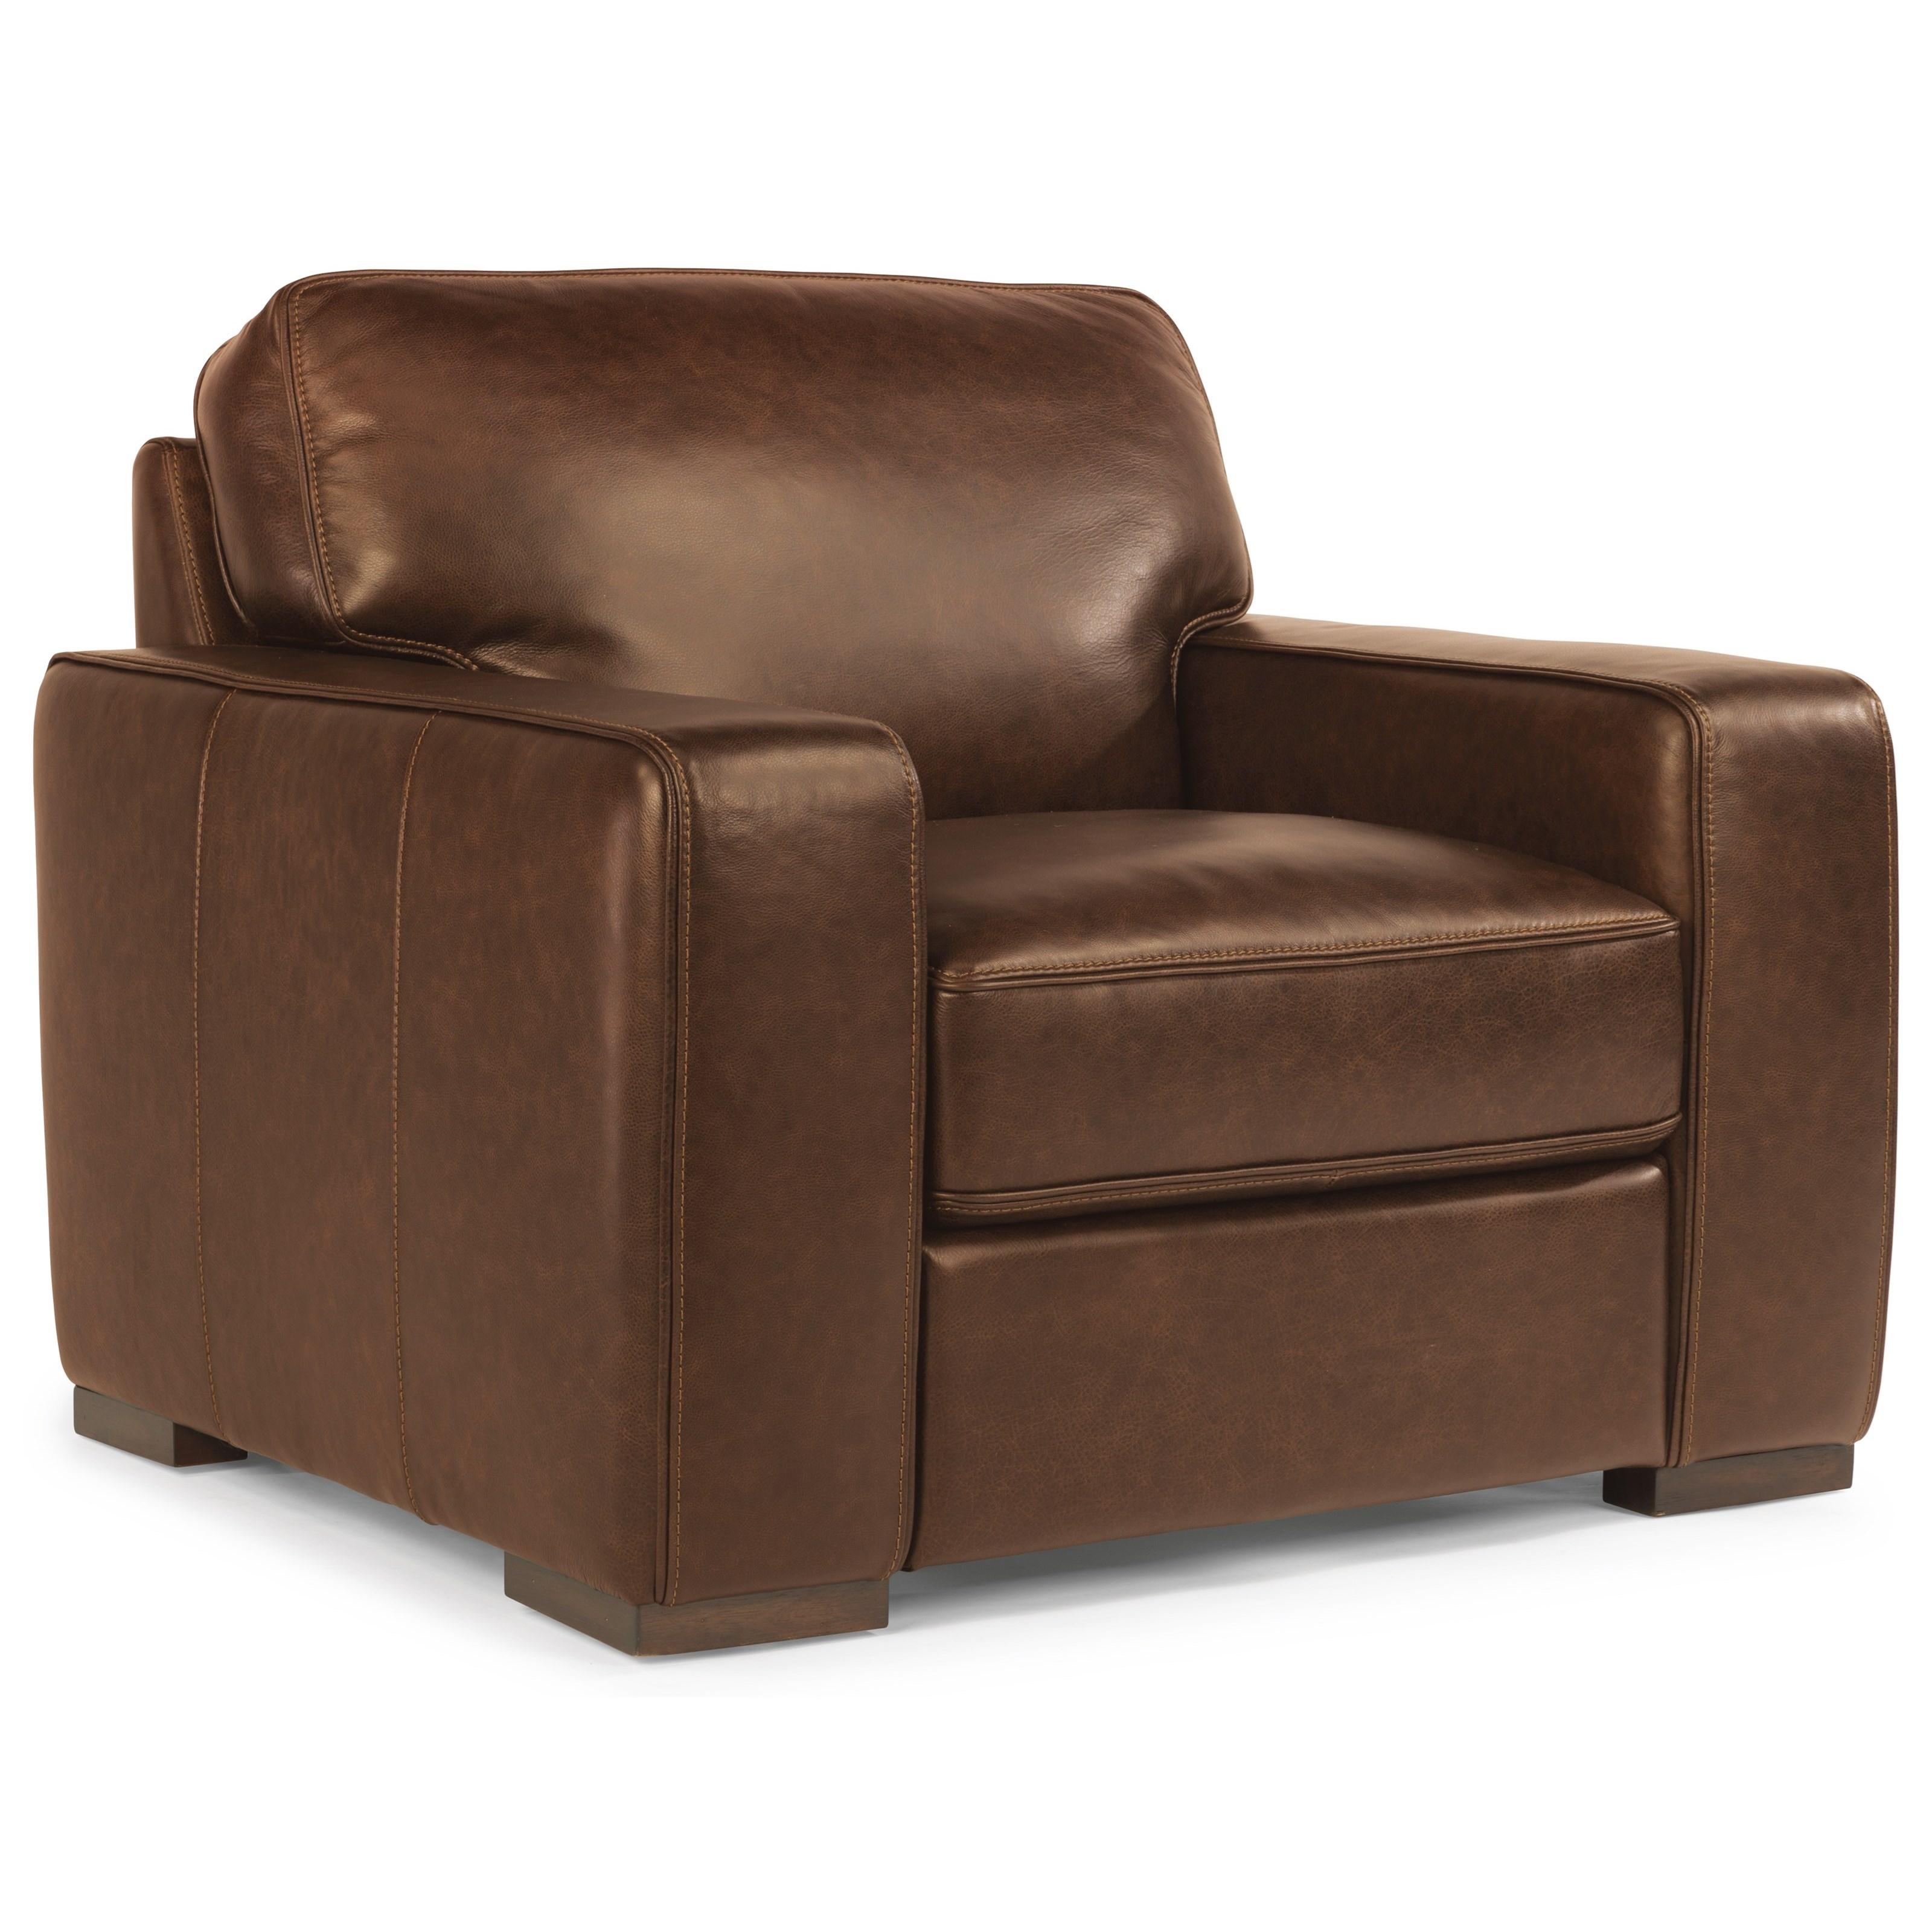 Flexsteel Latitudes-Mckinley Leather Chair  - Item Number: 1349-10